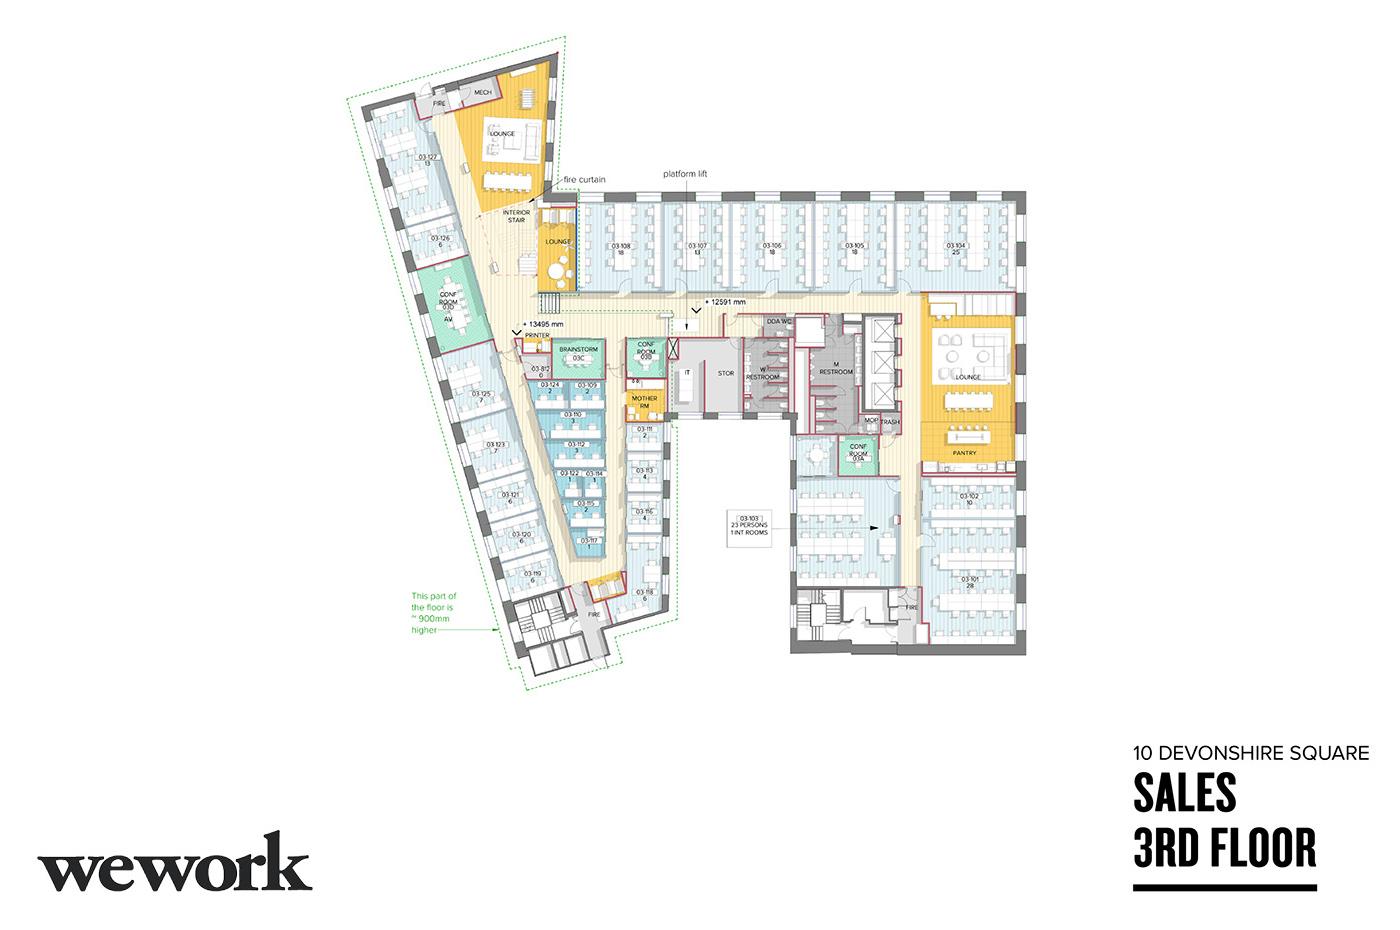 floorplans-15 copy.jpg